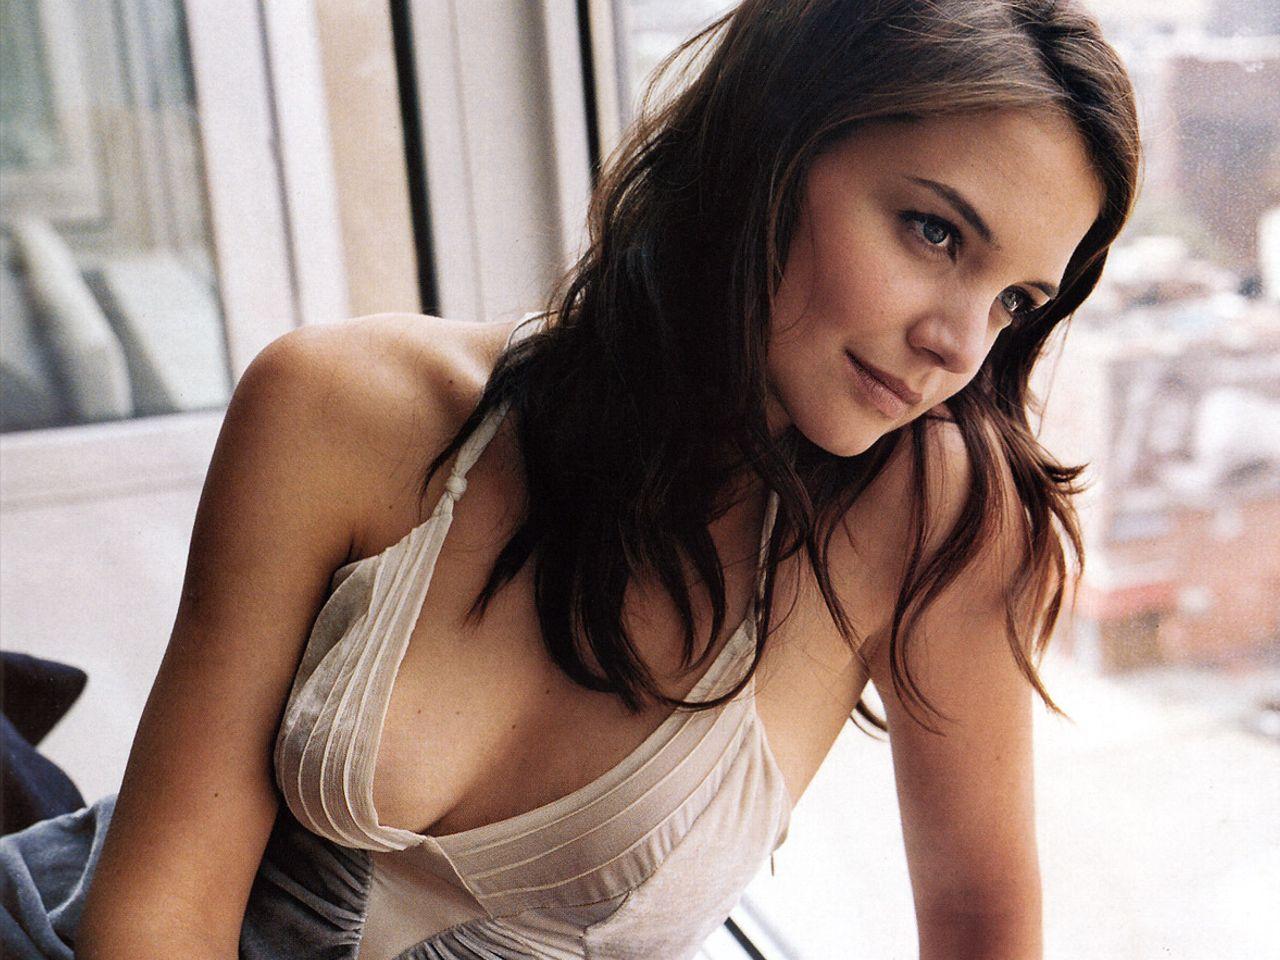 http://1.bp.blogspot.com/-E0OXZ7wGKjc/TqPpi67YX_I/AAAAAAAAD20/T7ChM_g1vdY/s1600/katie+holmes+cleavage.jpg